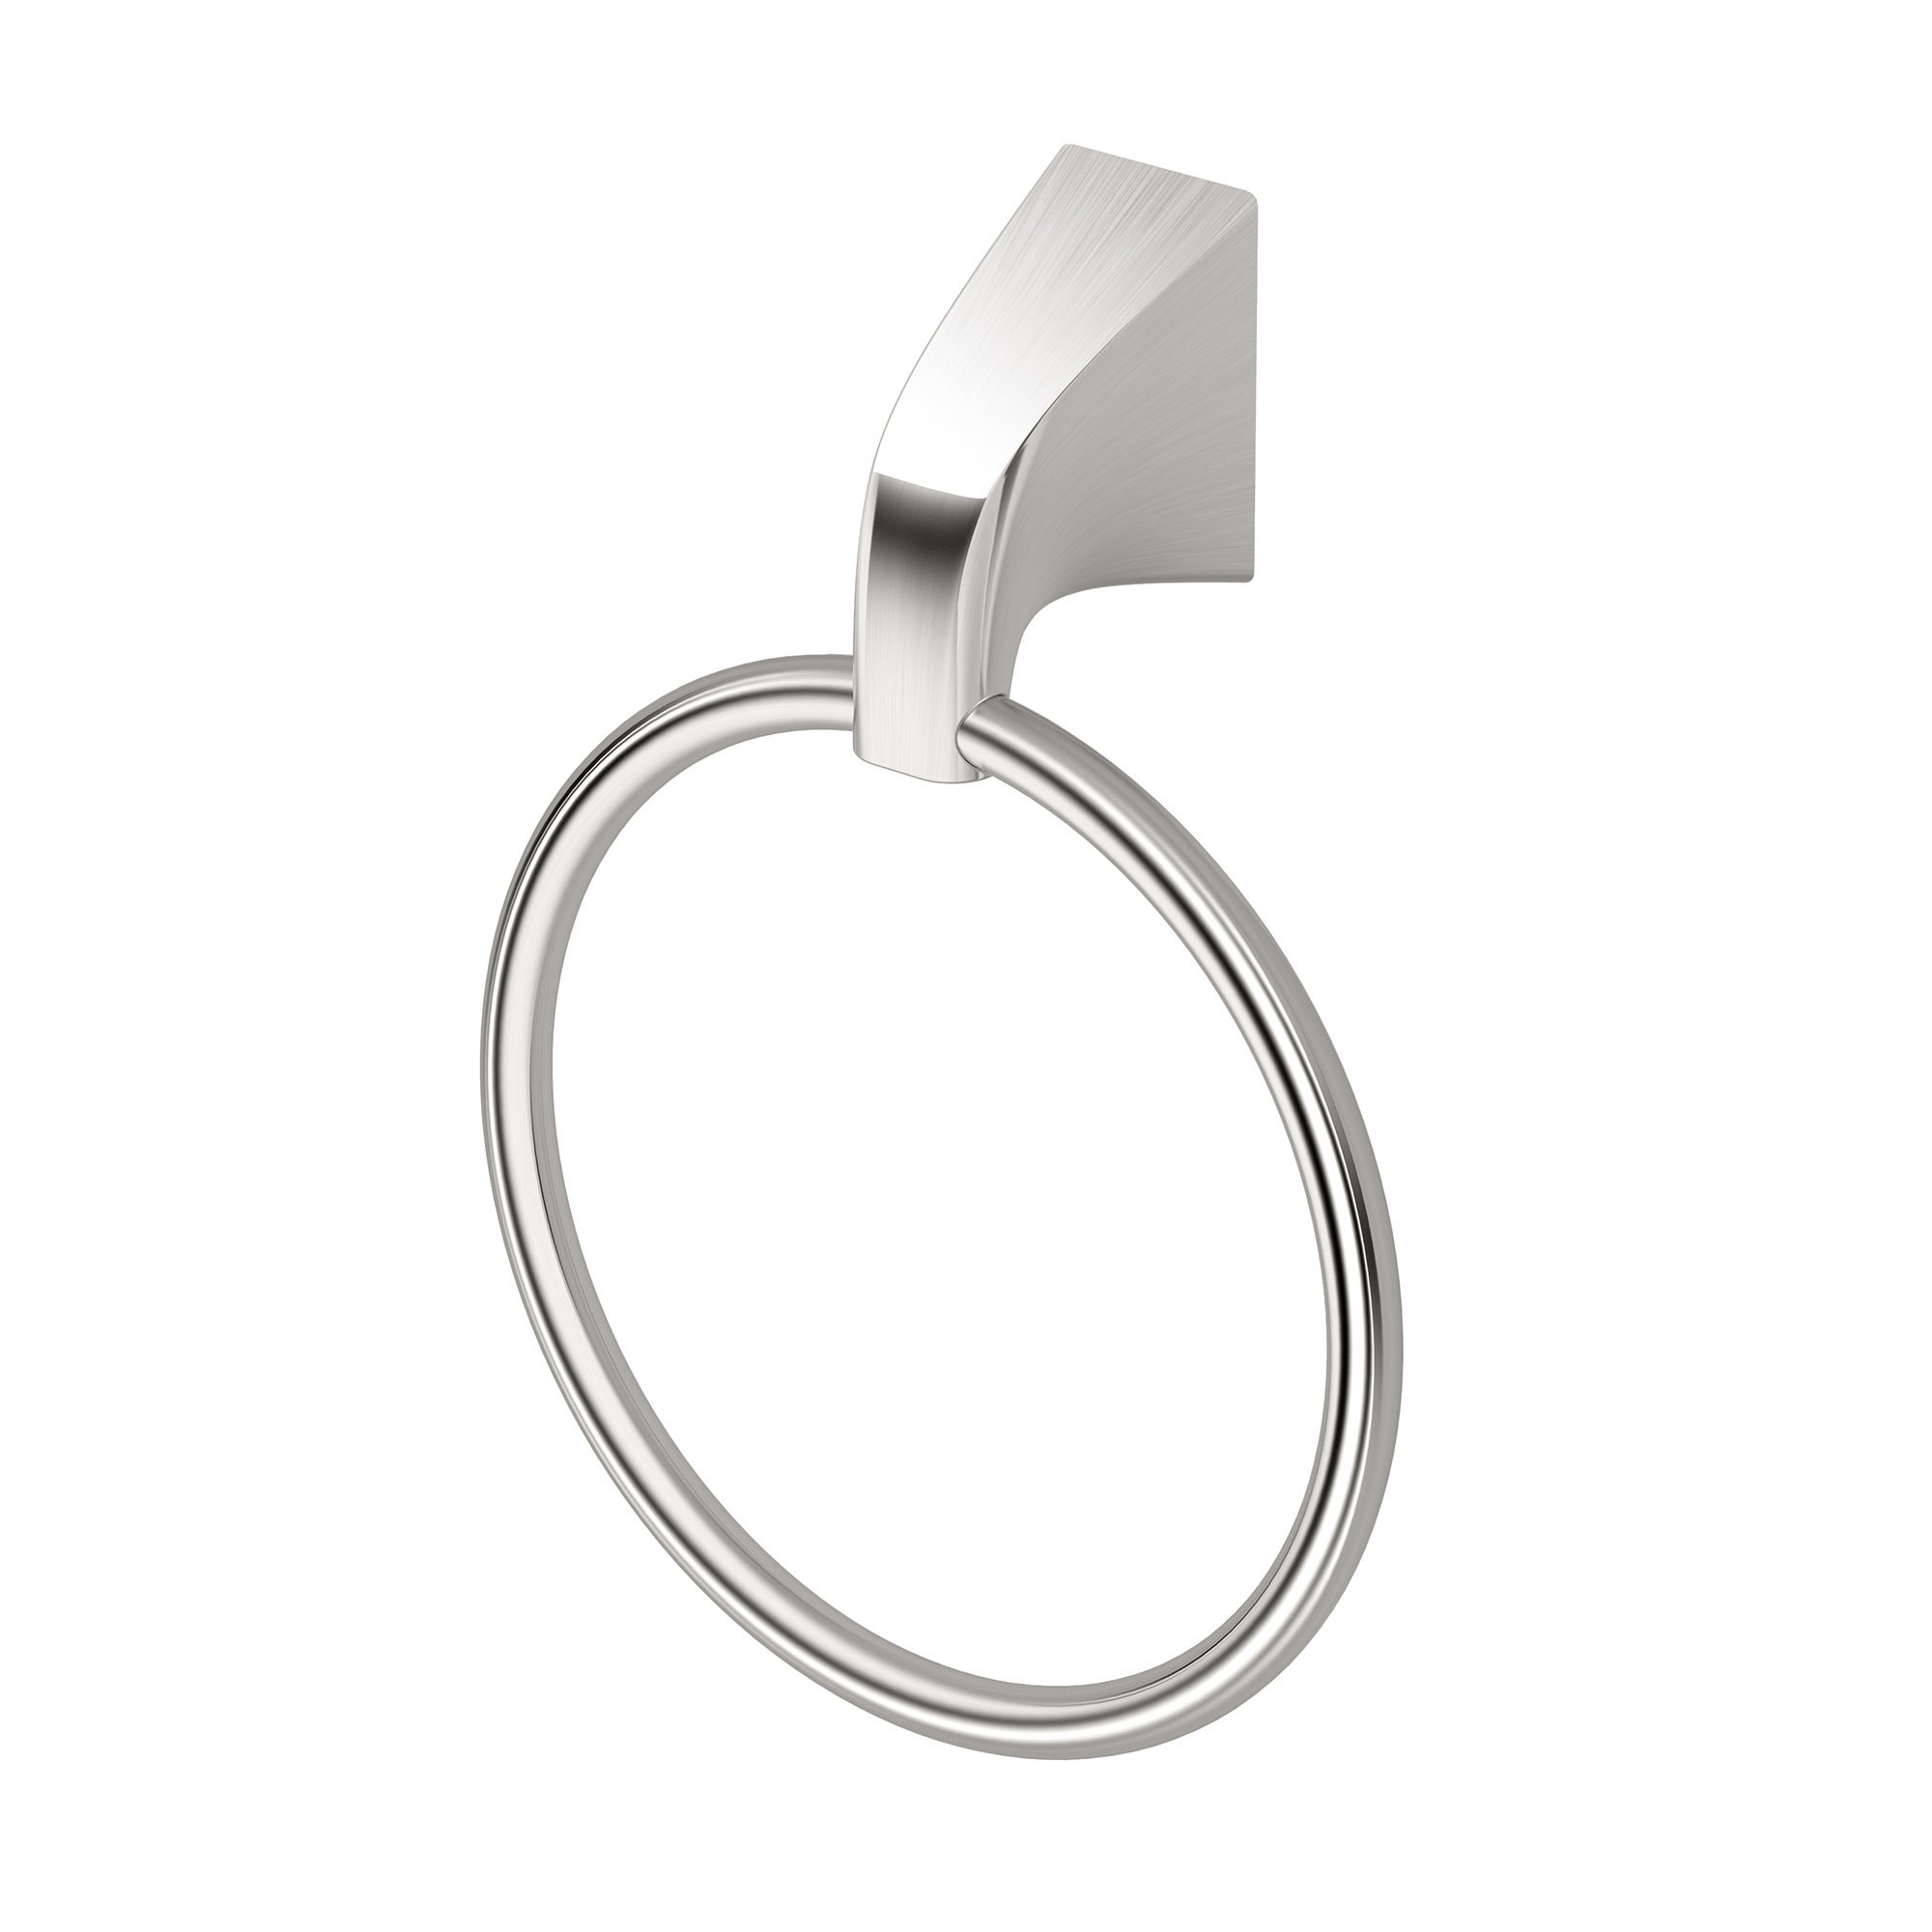 Gatco 5182 Quantra Bathroom Towel Ring, Satin Nickel